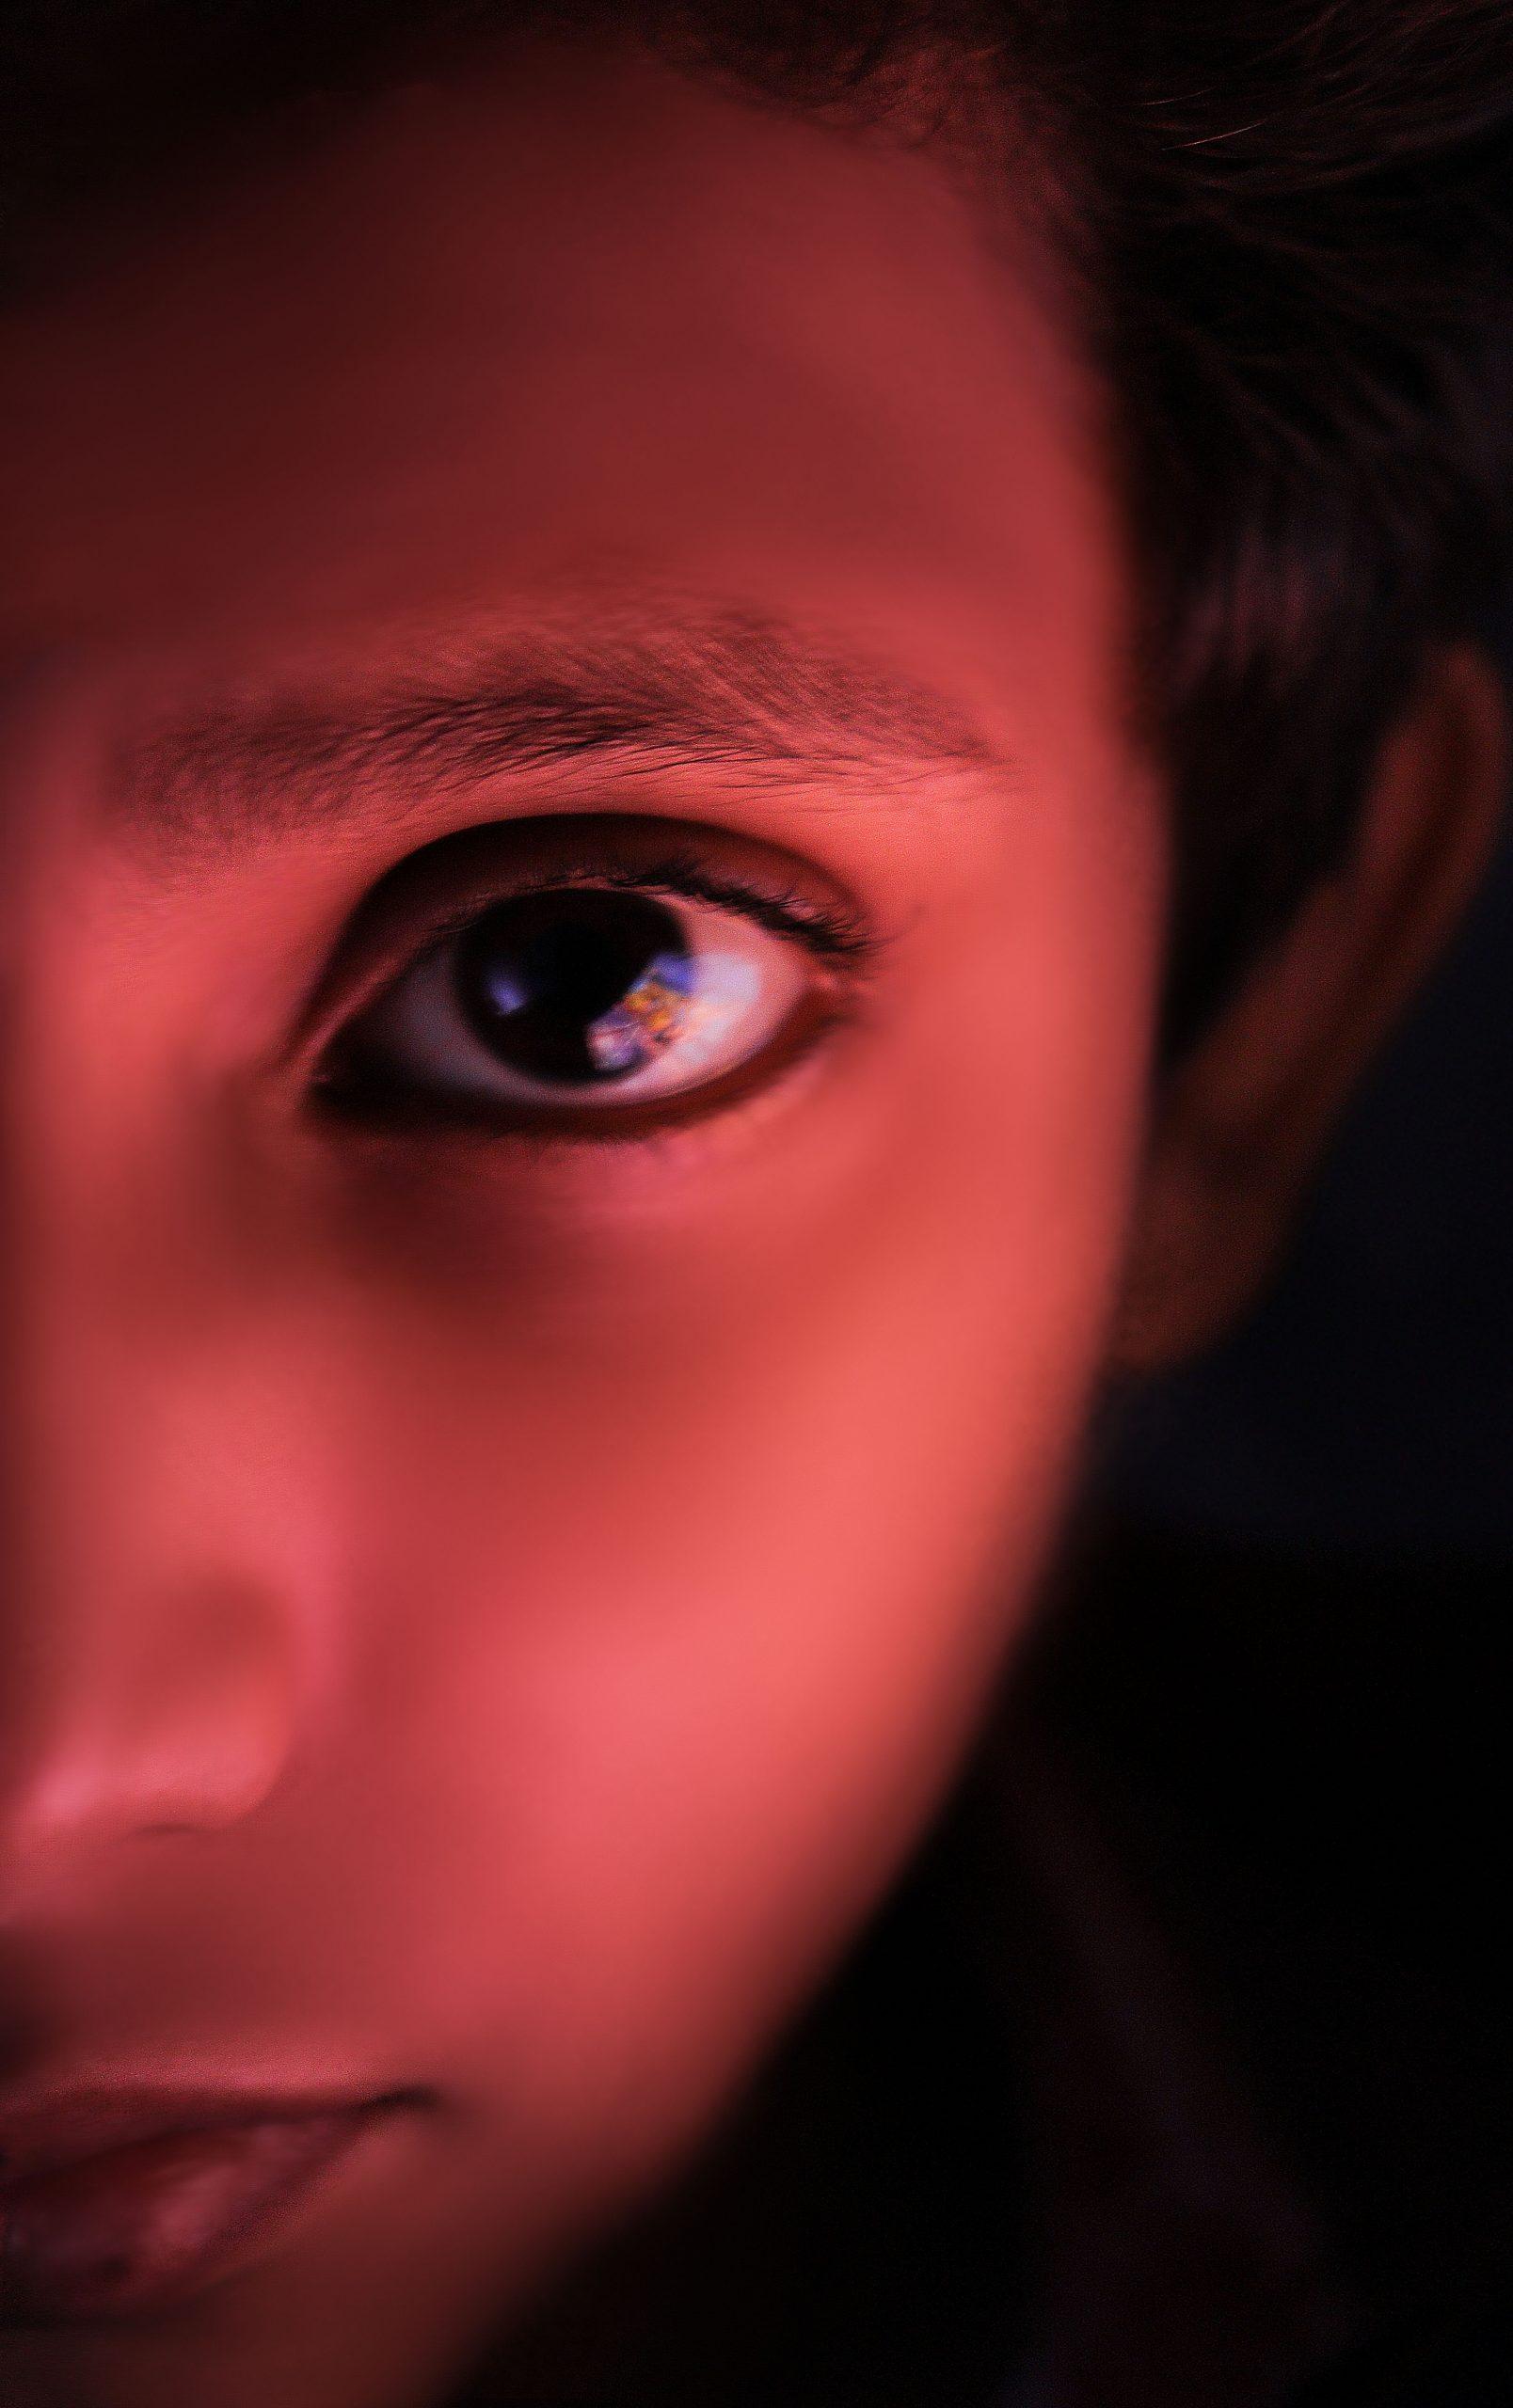 Left Profile of a child